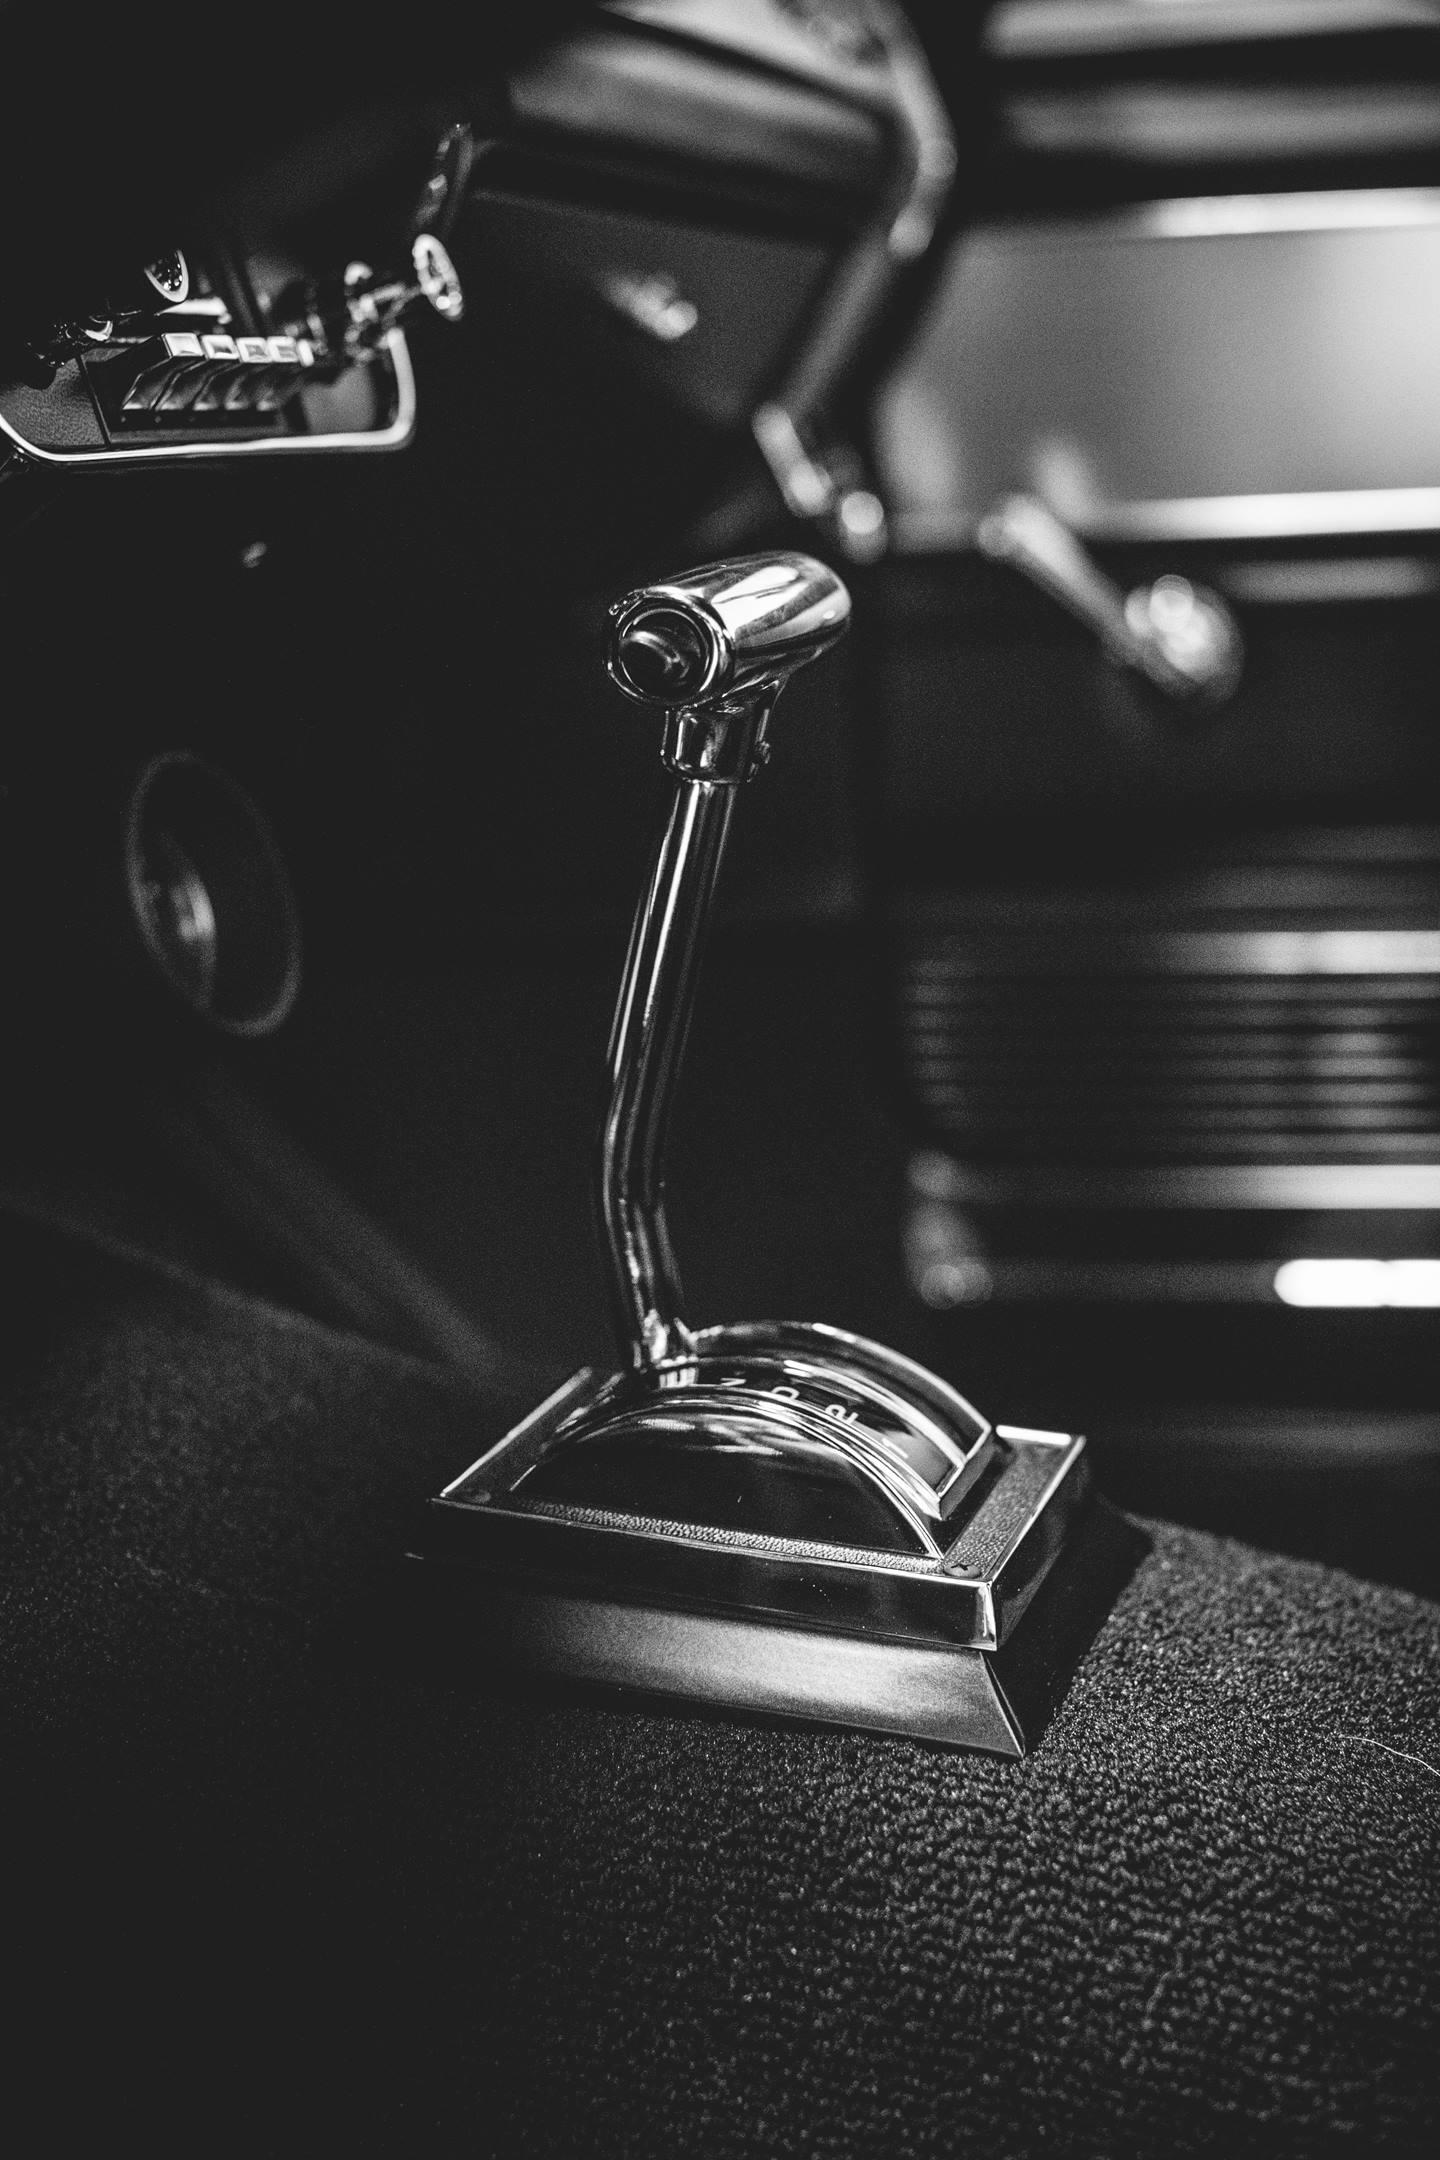 Revology Shelby GT350 shifter